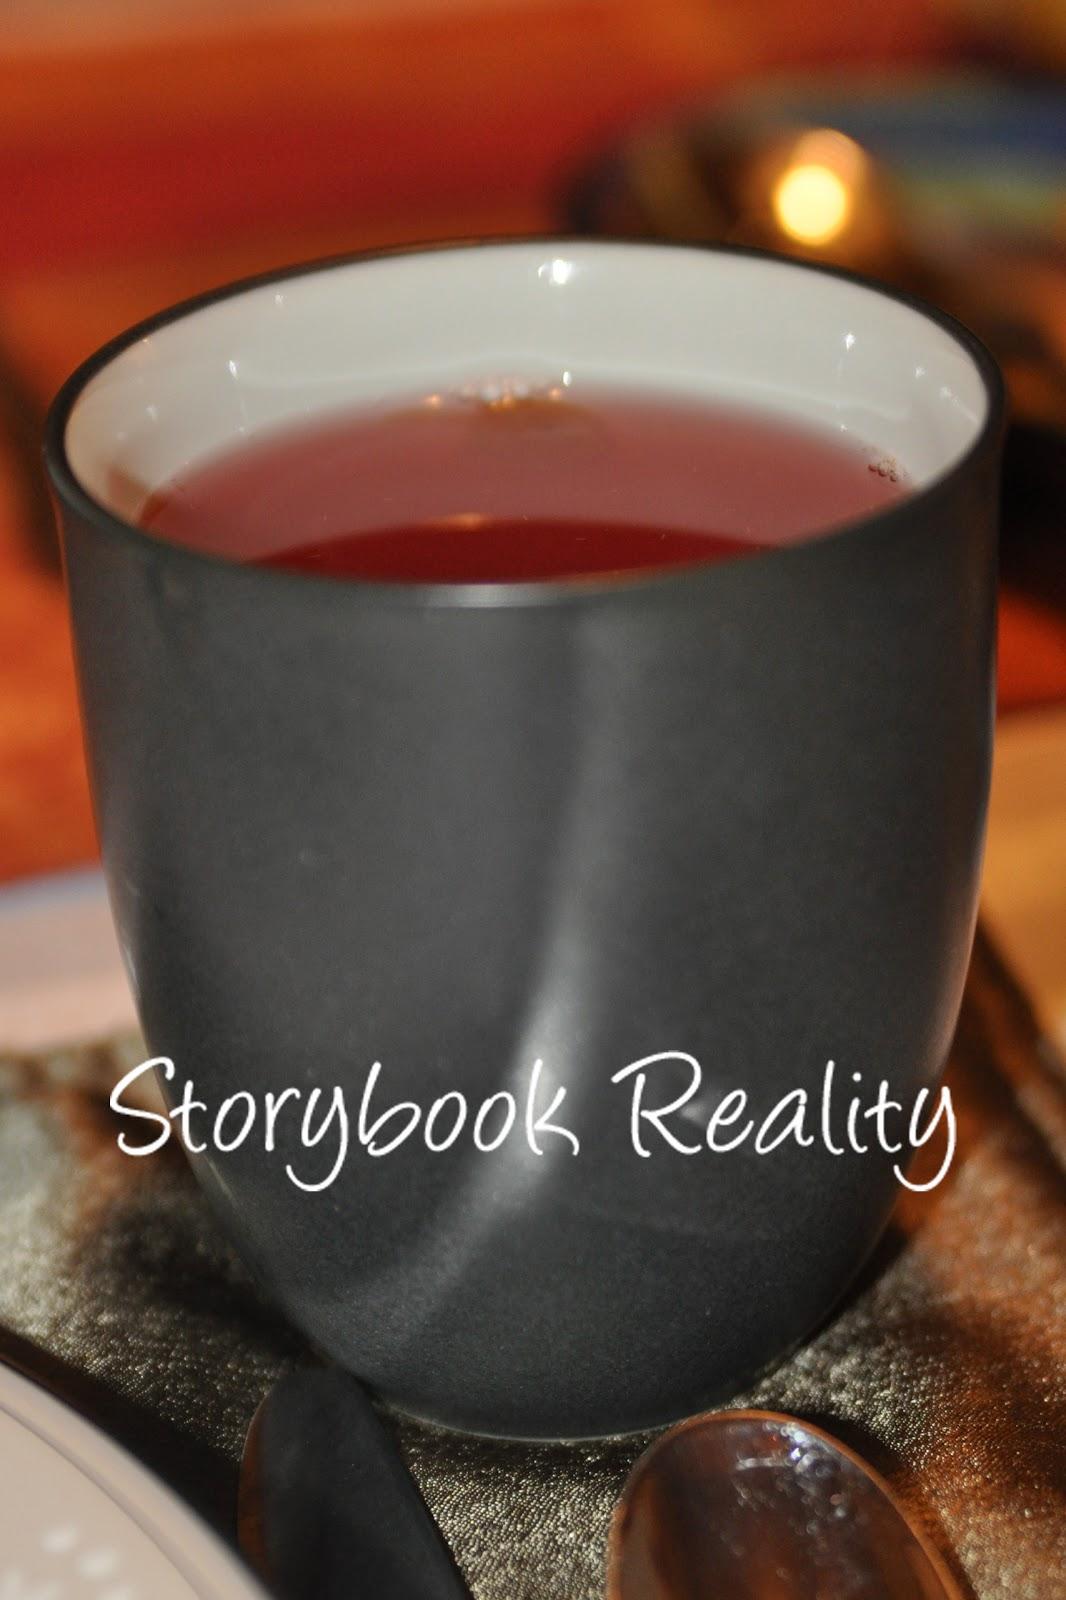 Laura @Storybook Reality: Christmas Cranberry Tea